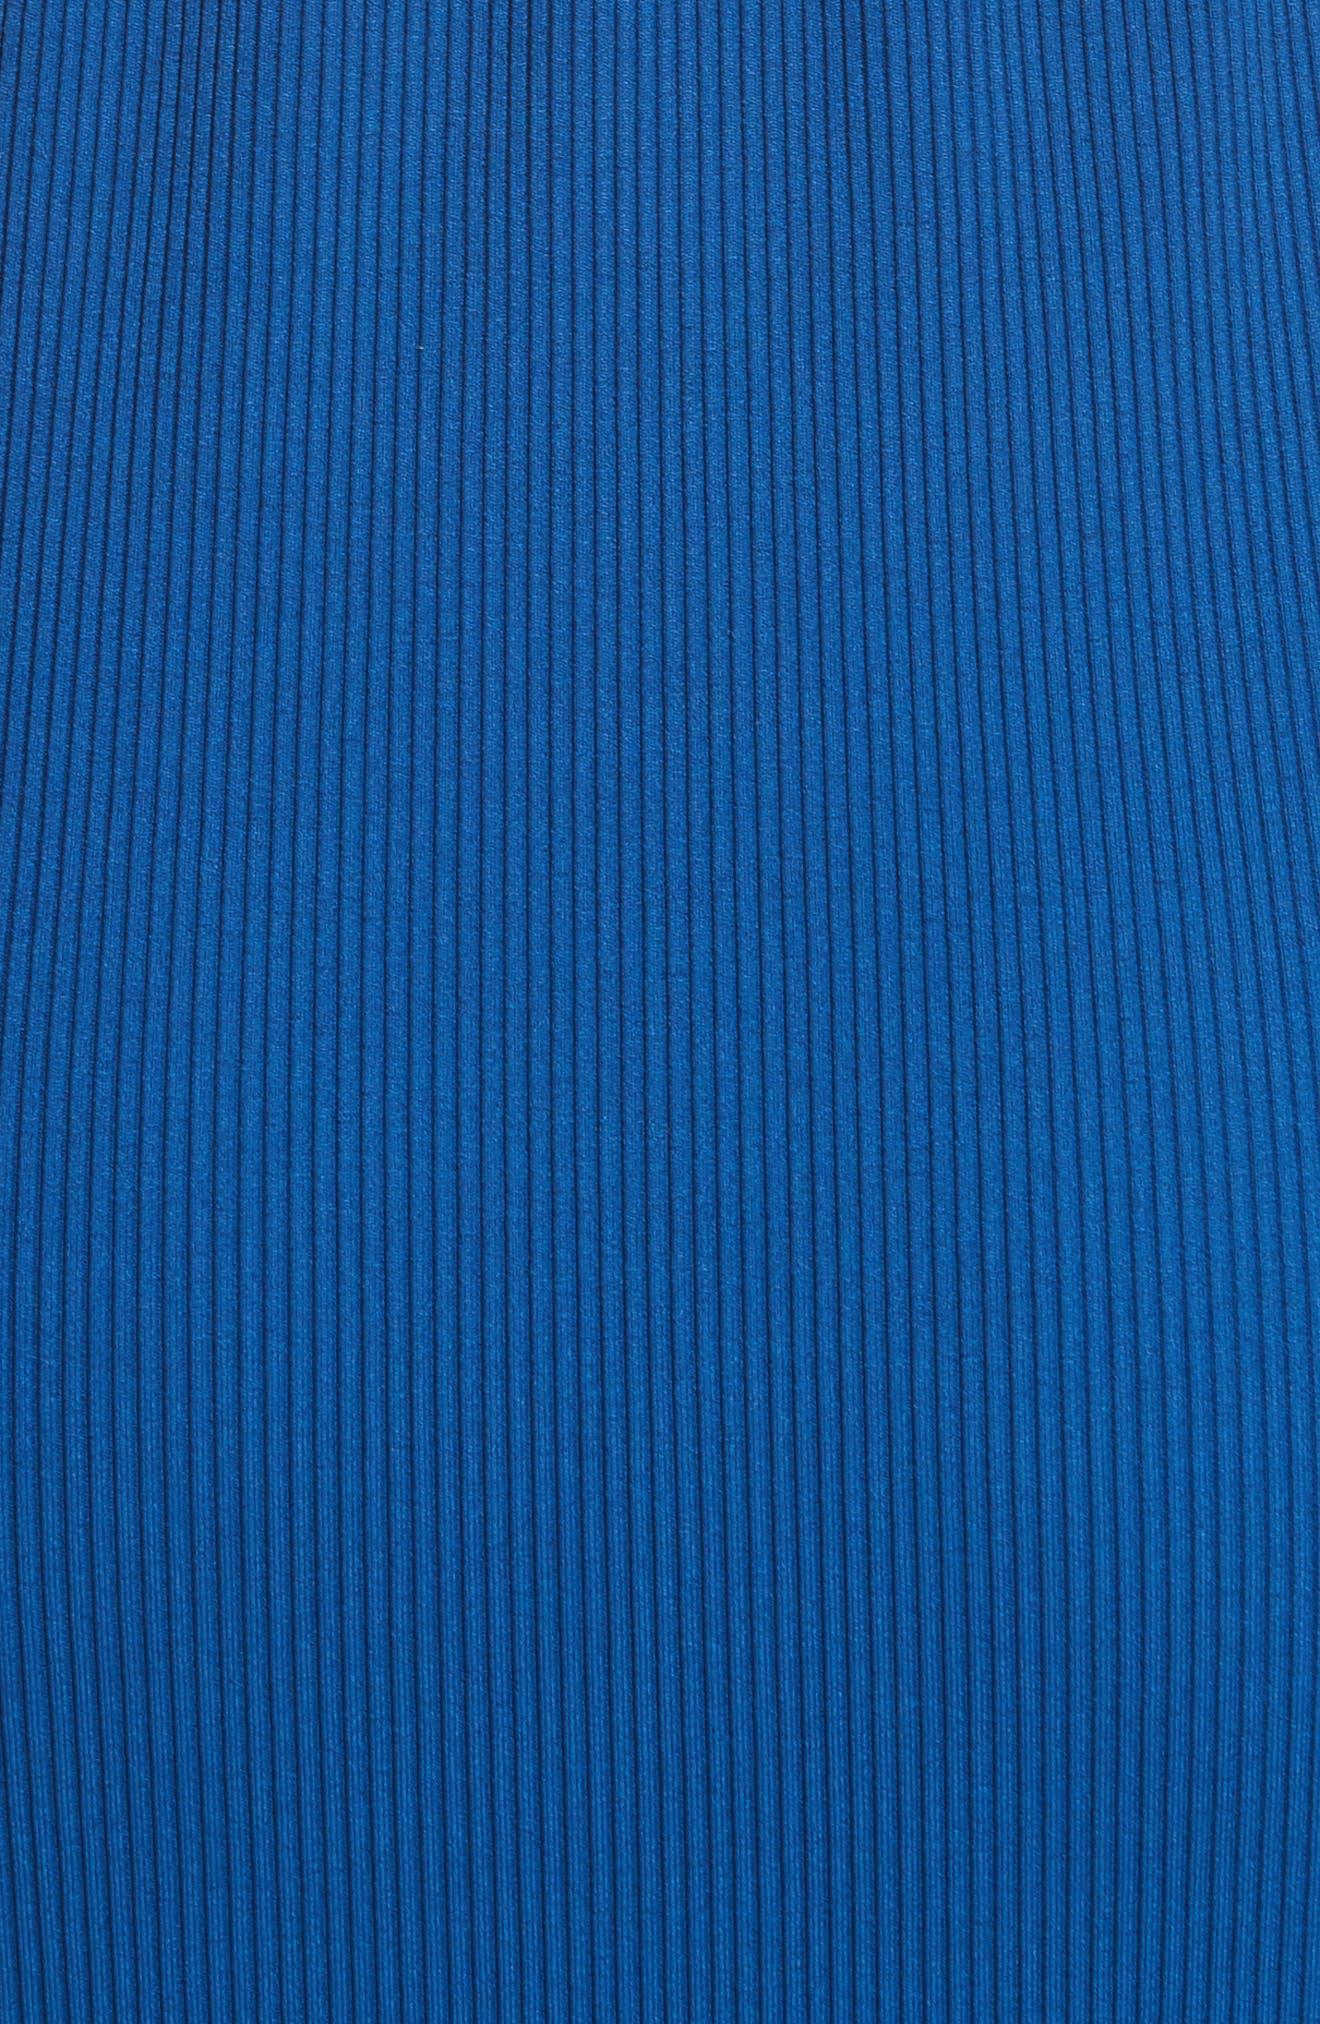 Diane von Furstenberg Ribbed Jersey Maxi Dress,                             Alternate thumbnail 5, color,                             412